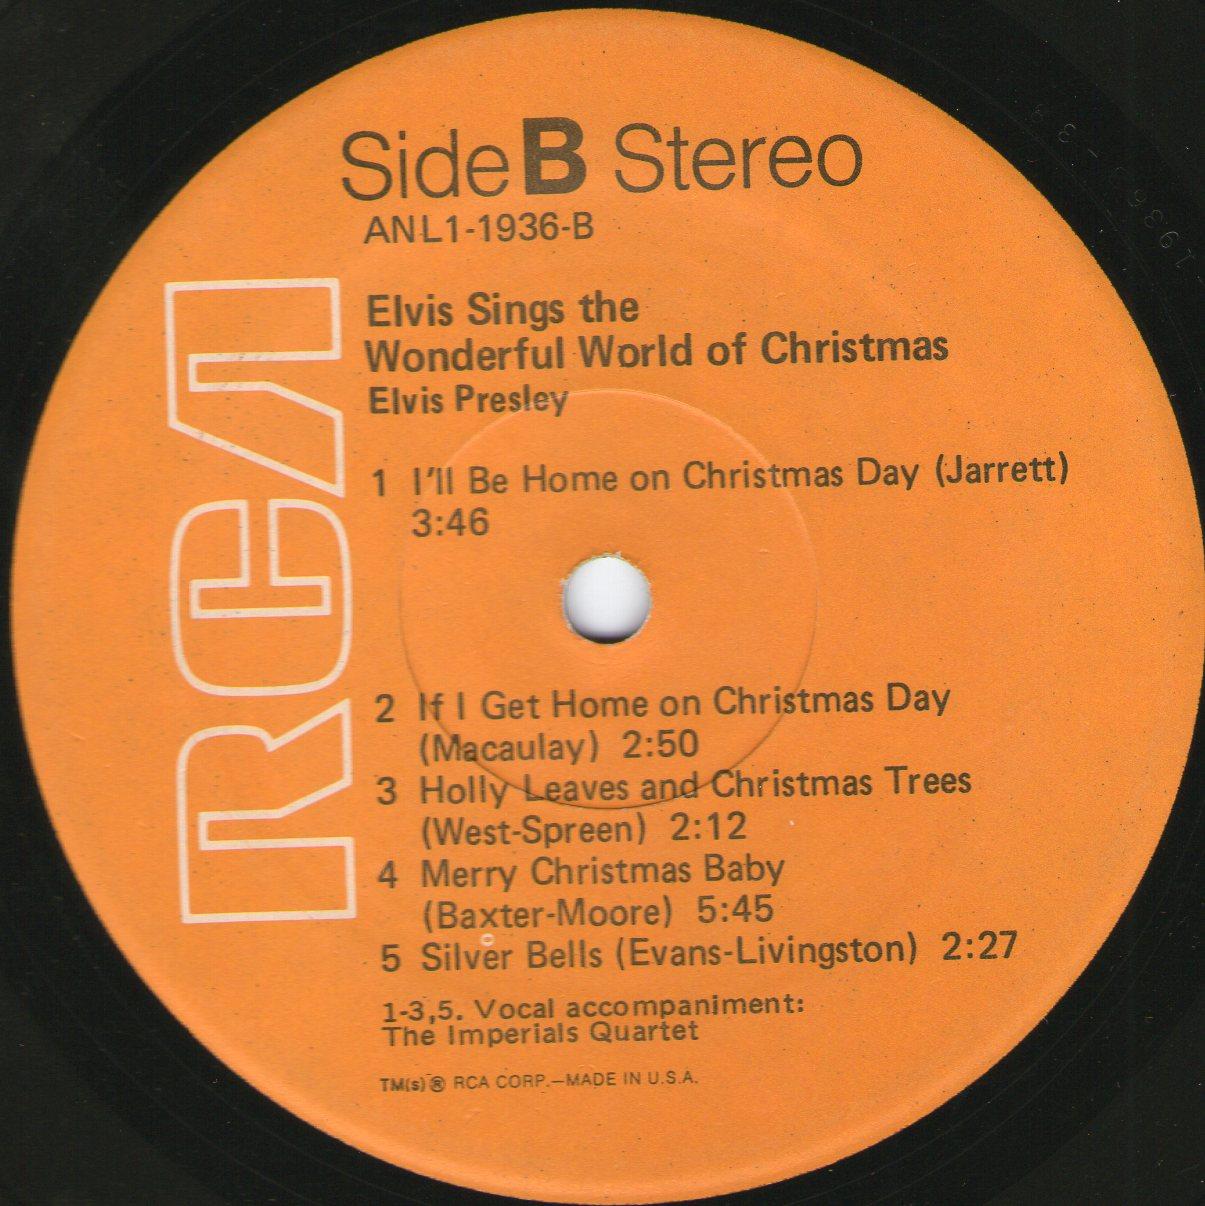 ELVIS SINGS THE WONDERFUL WORLD OF CHRISTMAS Img44097ssj